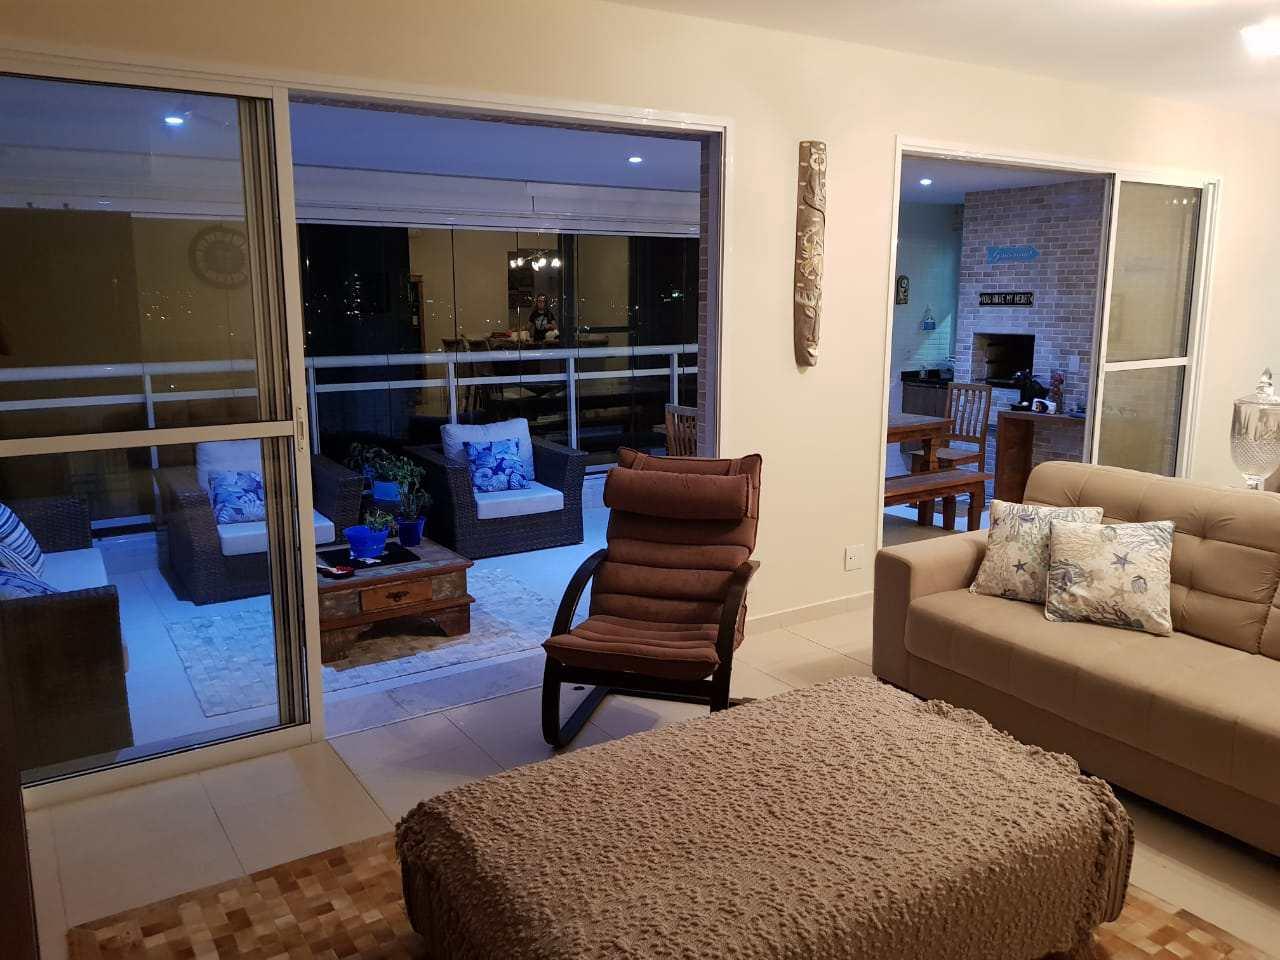 Apartamento com 3 dorms, Enseada, Guarujá - R$ 1.15 mi, Cod: 4841